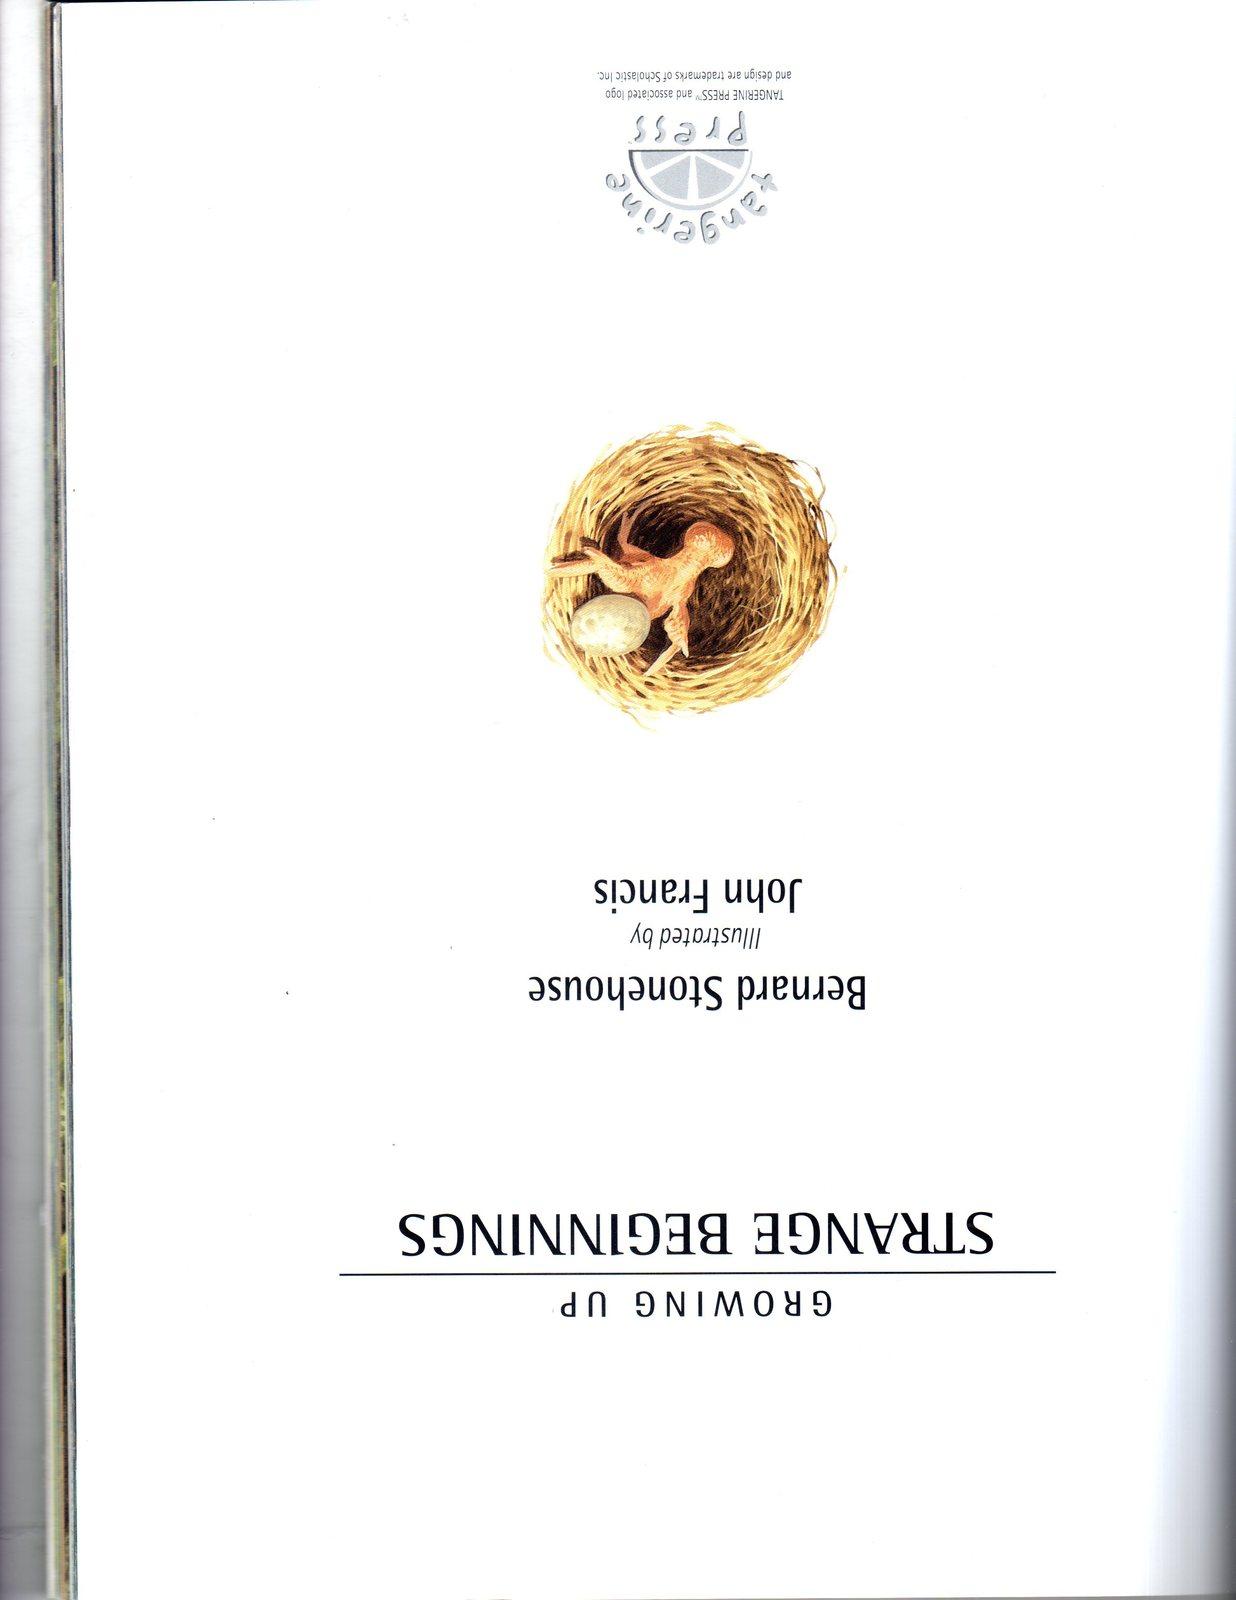 Growing Up Strange Beginnings by Bernard Stonehouse (2000)